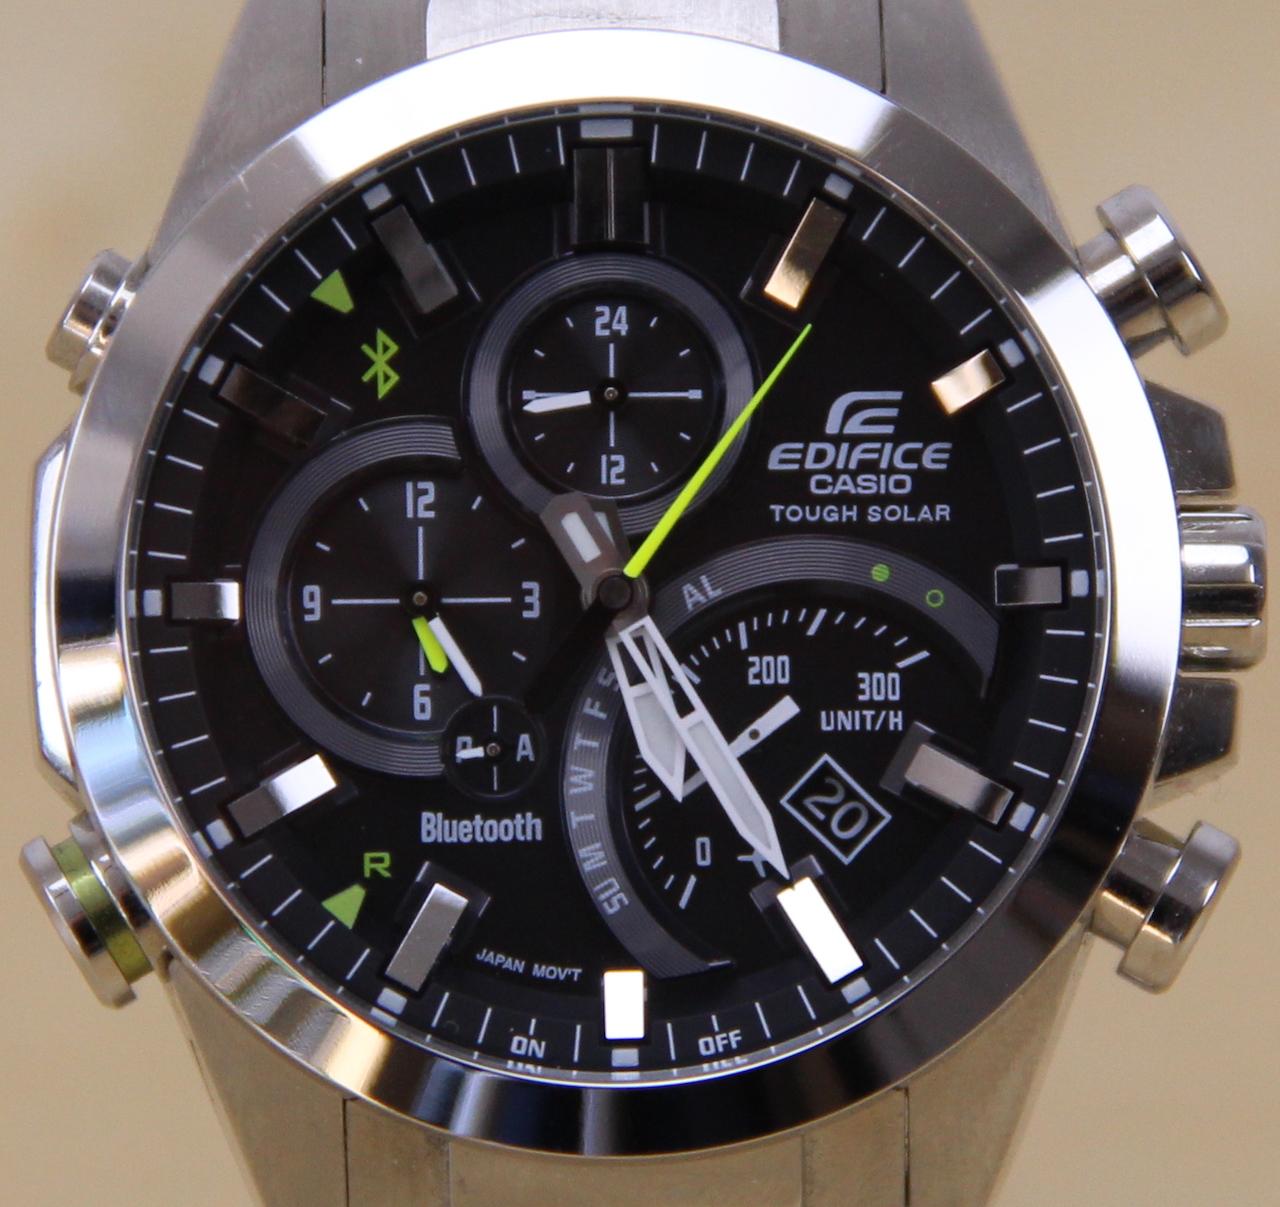 Casio Edifice Eqb 500 Connected Watch Im Test Newgadgets De